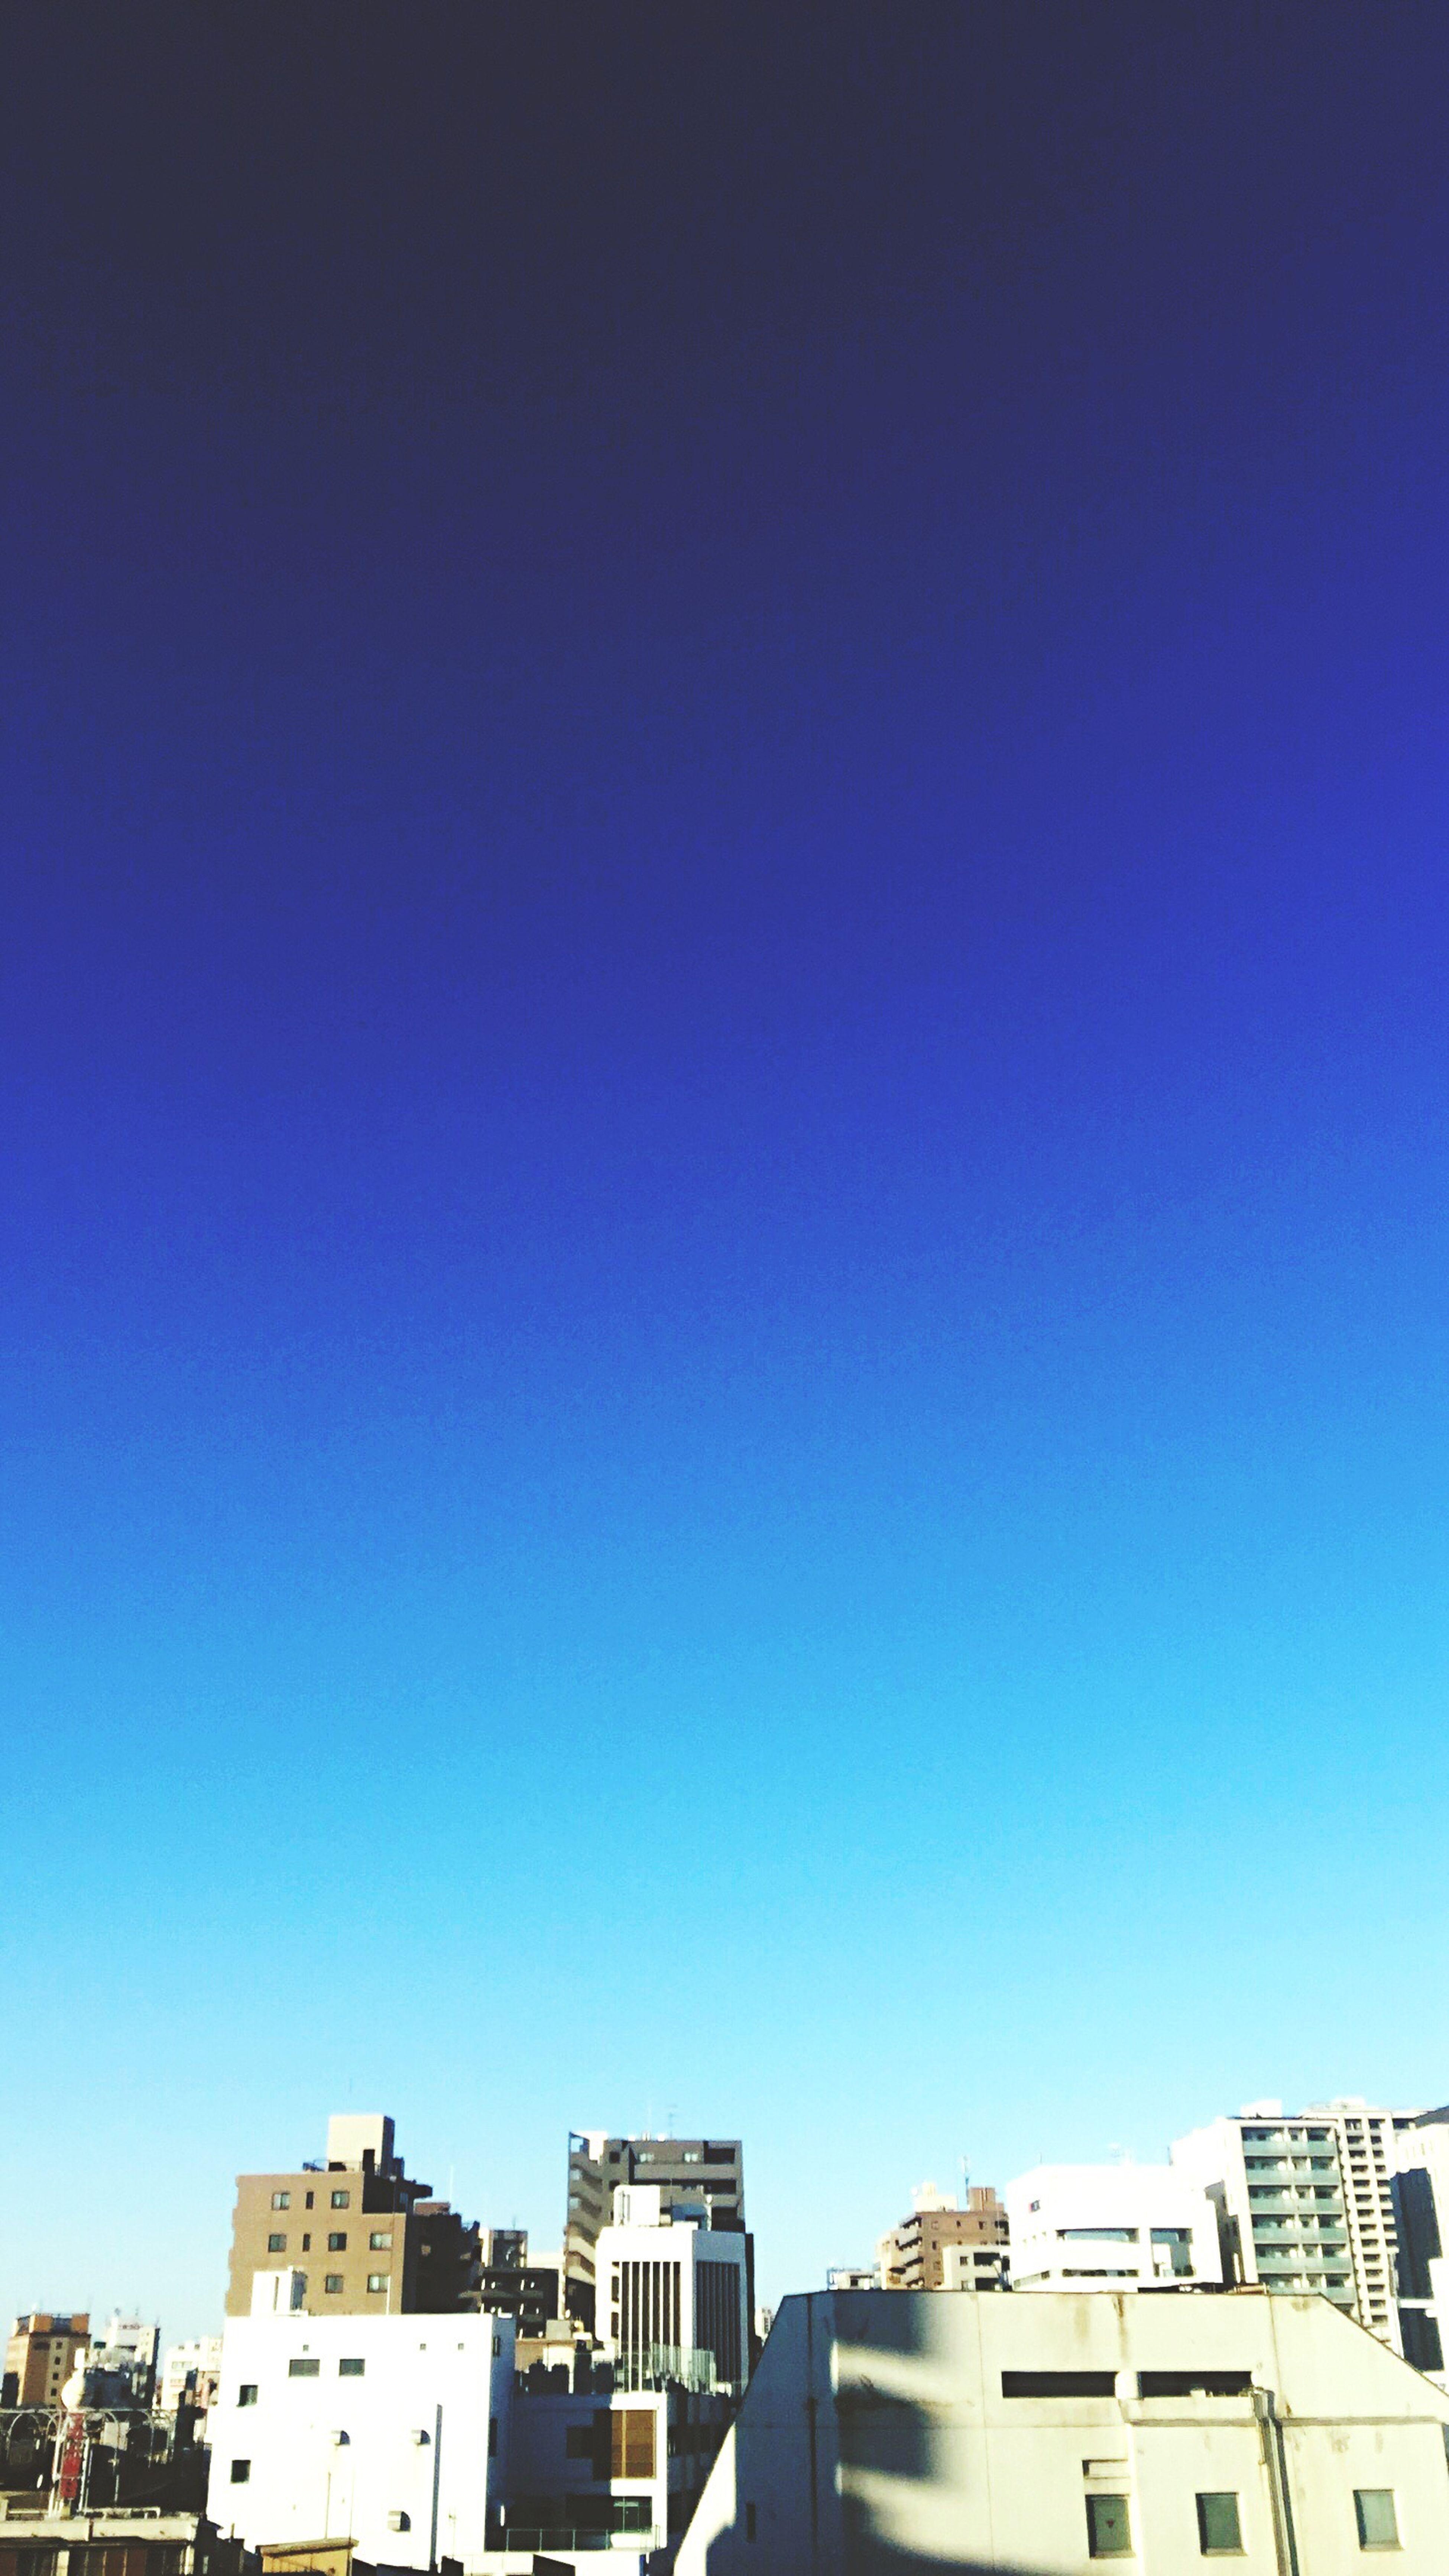 2017 New Year Clear Sky Blue Day Sky Tokyo,Japan 赤羽